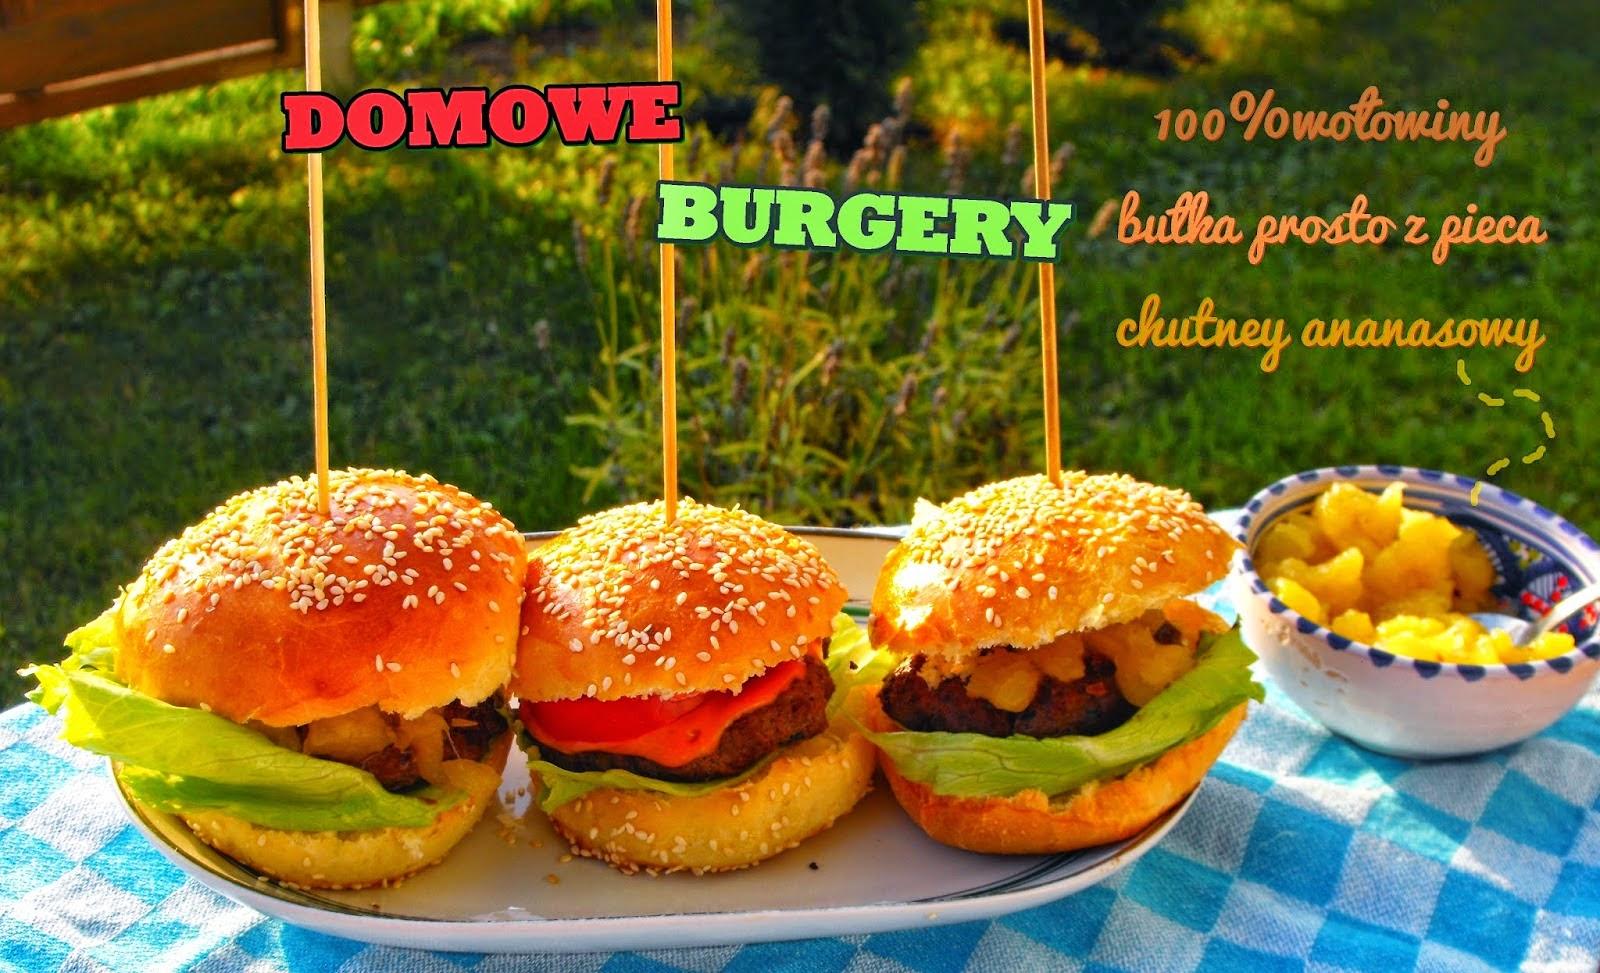 http://teczawsloiku.blogspot.com/2014/09/domowe-burgery-z-woowina-i-chutney.html